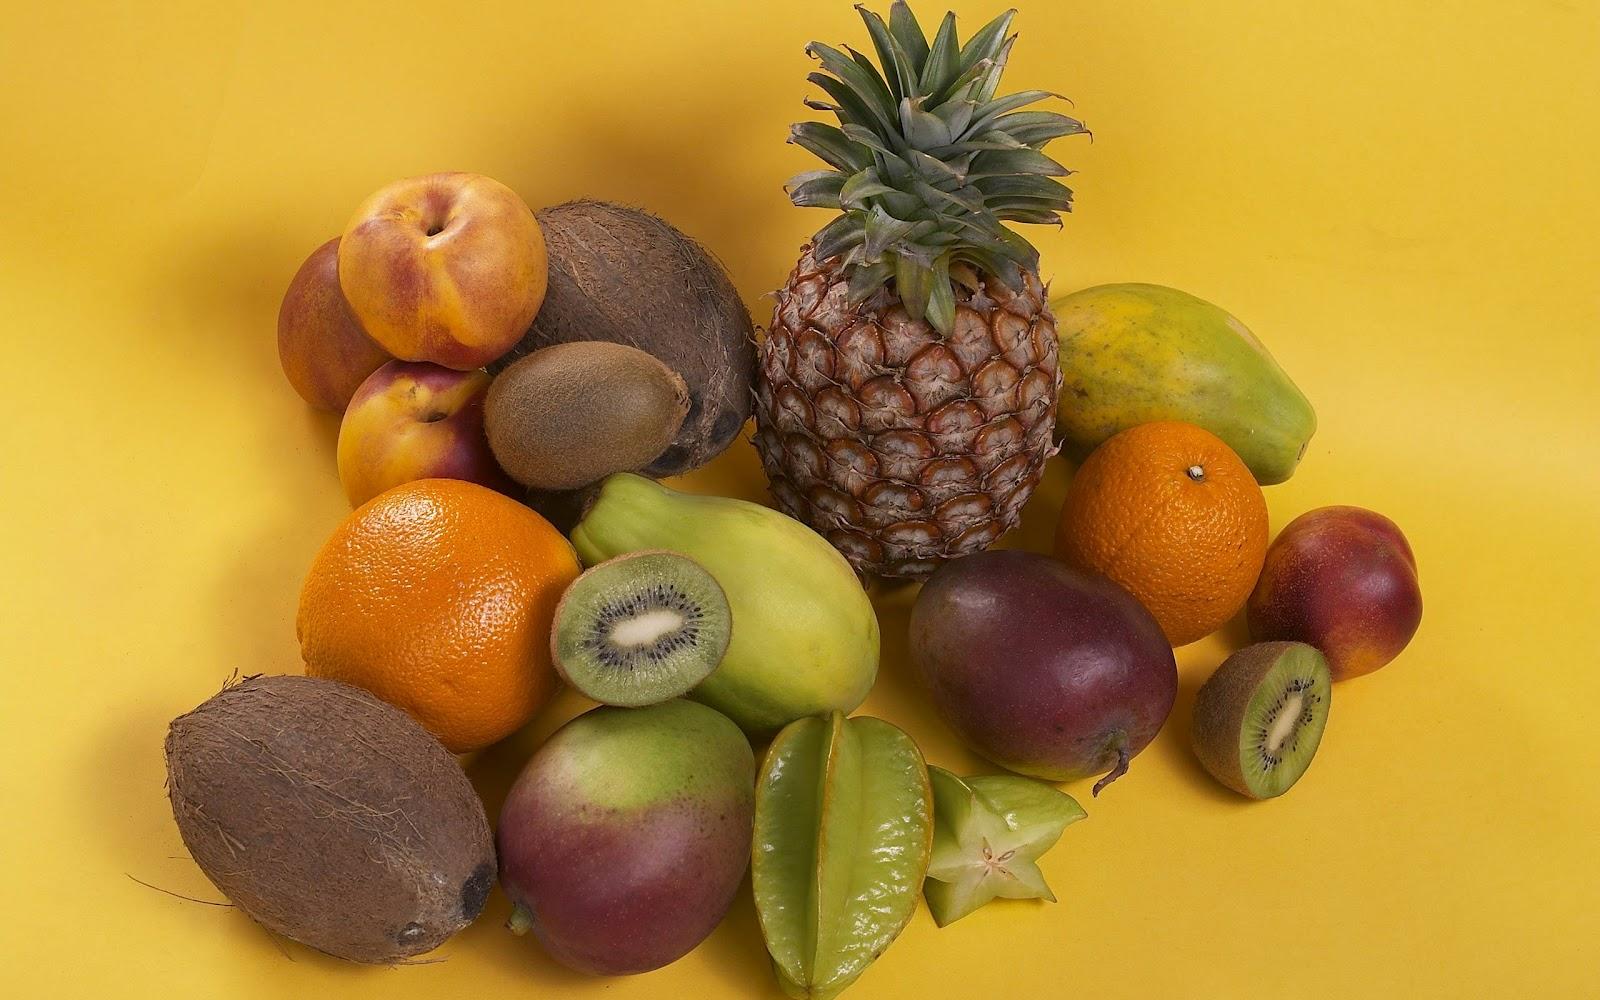 http://4.bp.blogspot.com/-D01MsKV592Y/UFFqDIE7HLI/AAAAAAAAJ9k/K_r7gpCFDug/s1600/Frutas+Naturales+%5B+Wallpaper+HD+%5D.jpg